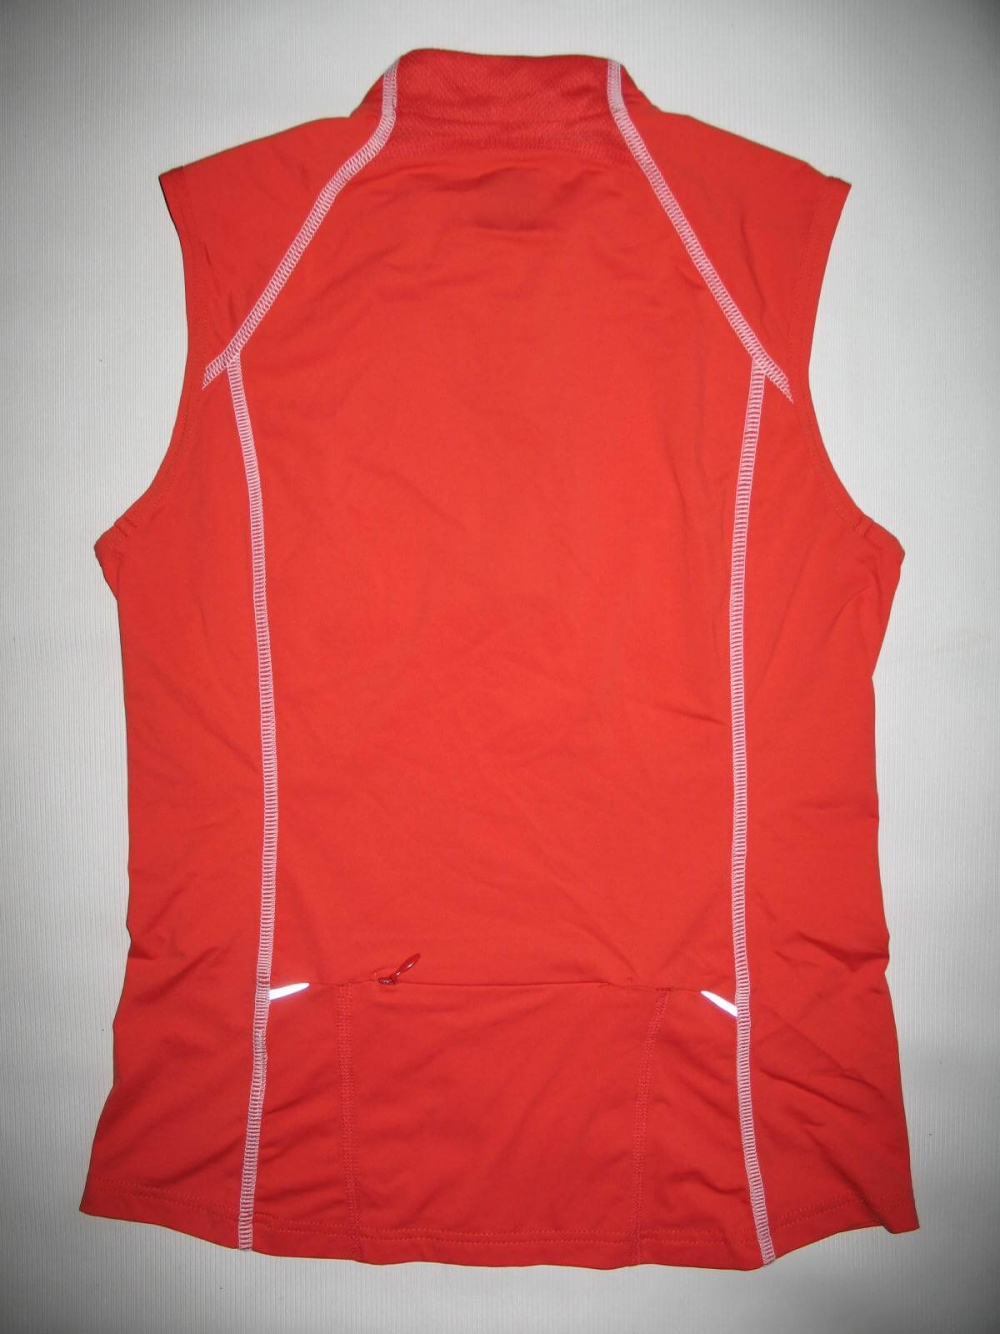 Веломайка GORE bike wear sleeveless jersey lady (размер 36/S) - 1